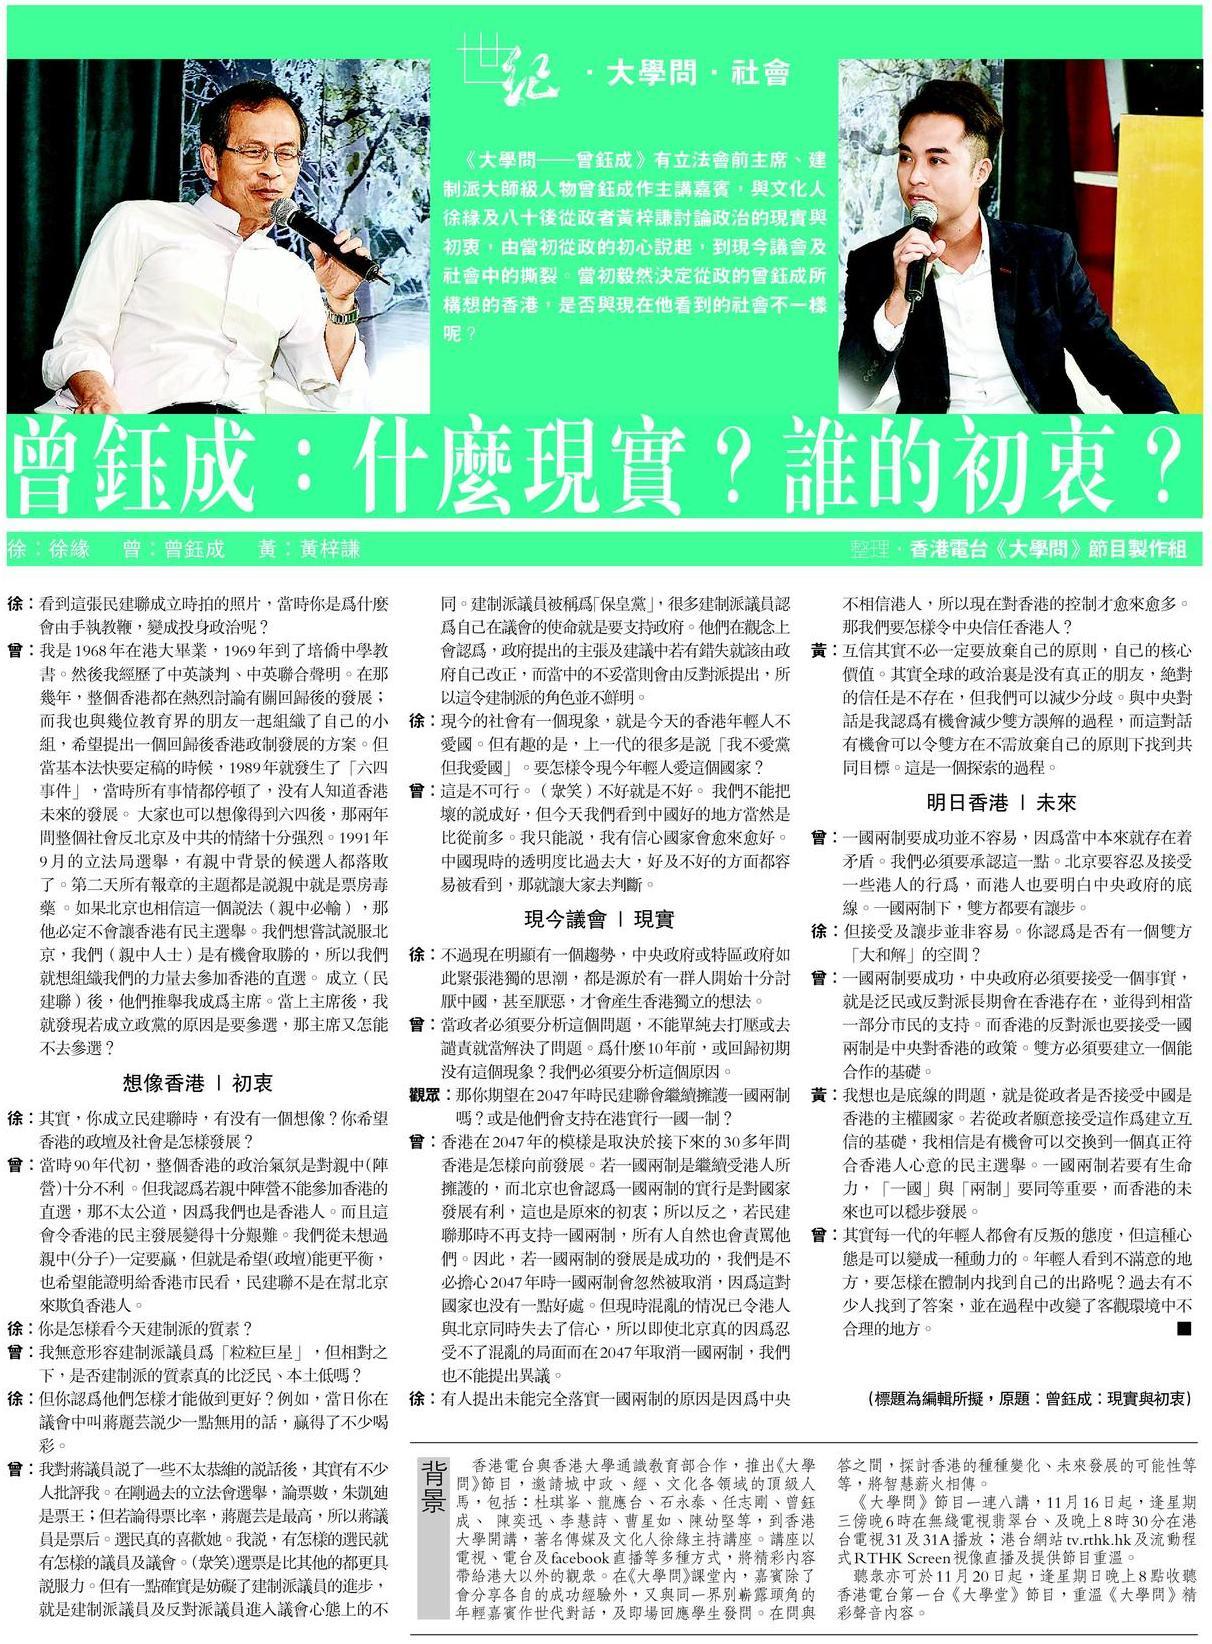 161123_mingpao_%e5%a4%a7%e5%ad%b8%e5%95%8f